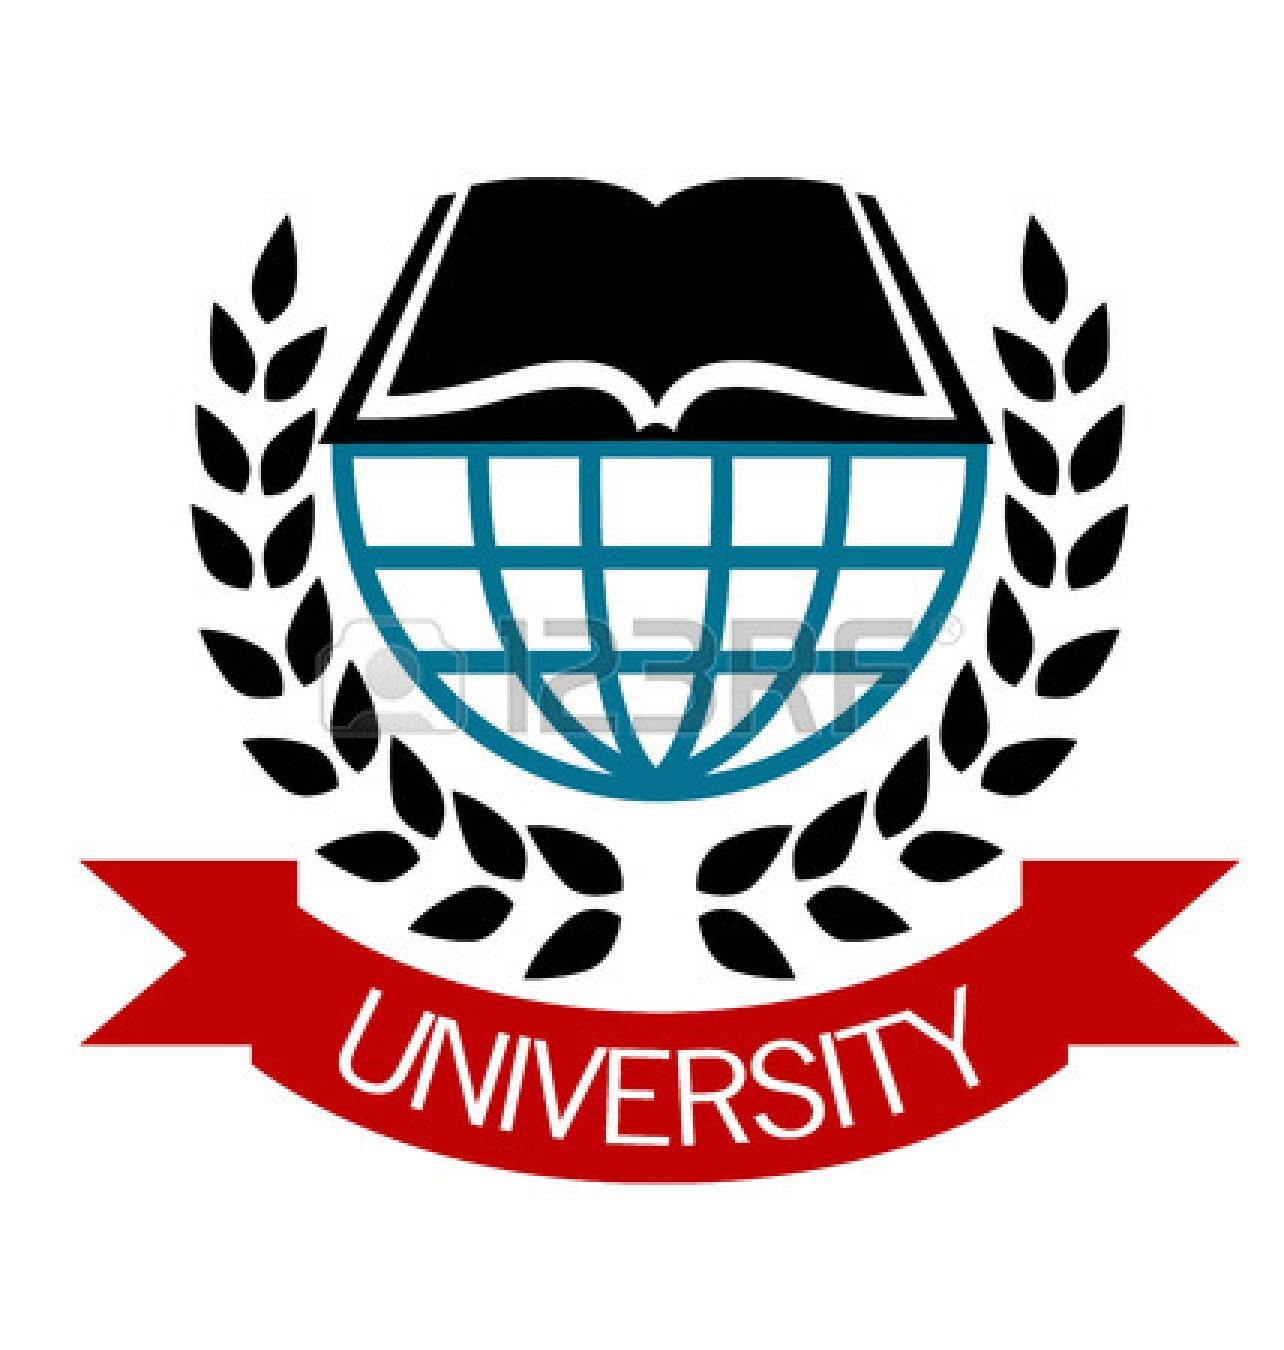 The Word University.